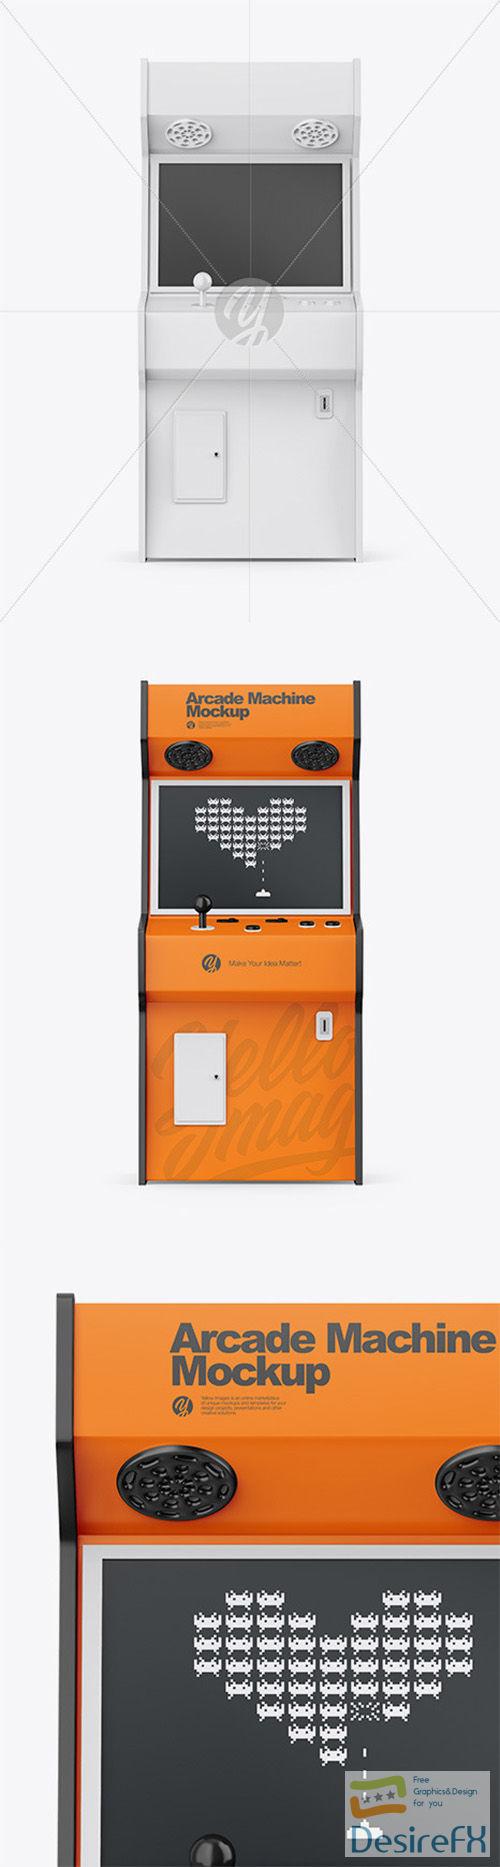 Arcade Machine Mockup 66553